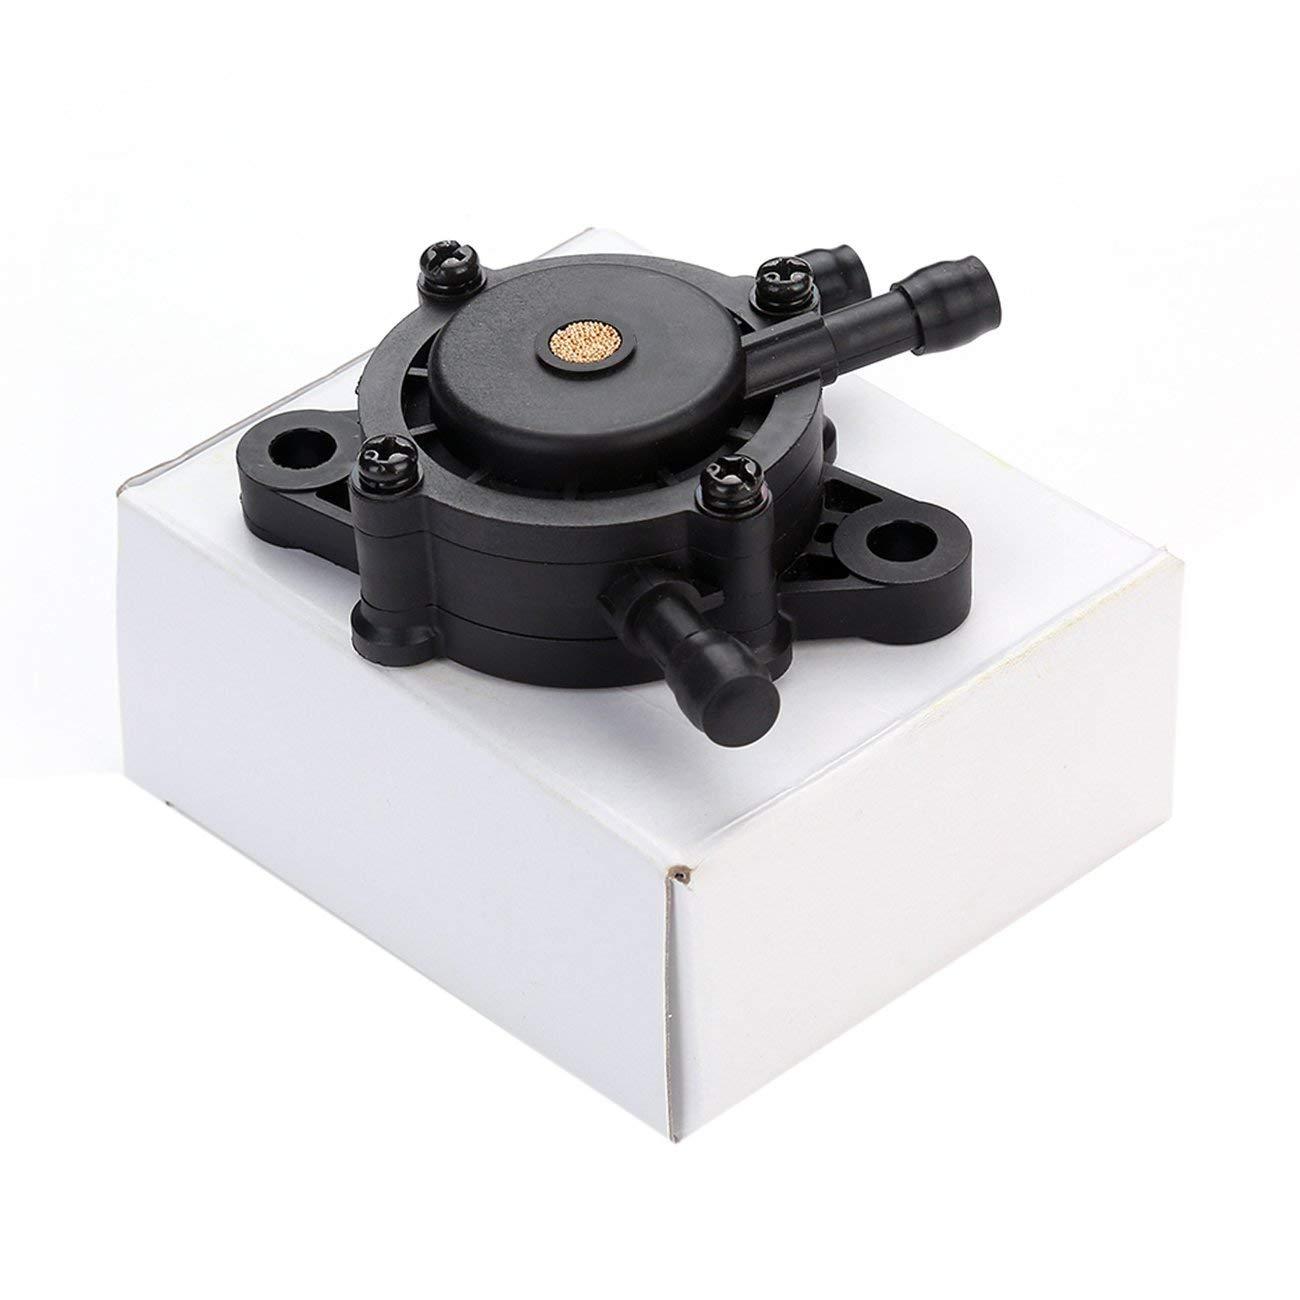 Panda 491922 691034 692313 808492 808656 Fuel Pump Fit for Mikuni Briggs /& Stratton Motorcycles Vehicles Oil Burning Pump